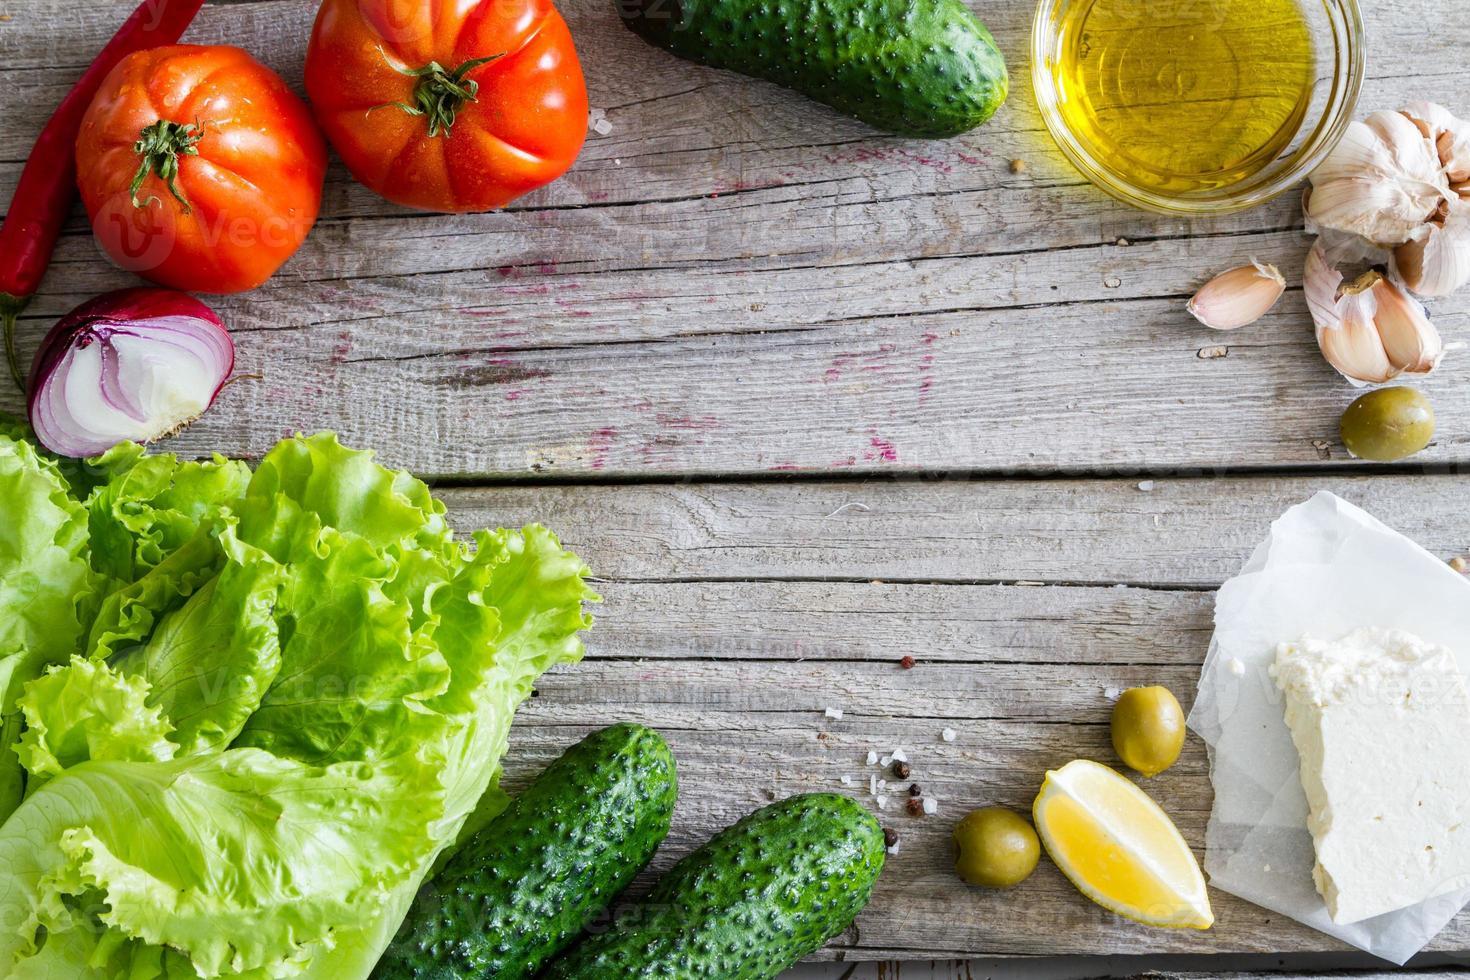 ingredientes da salada grega - tomate, cucmber, salada, cebola foto